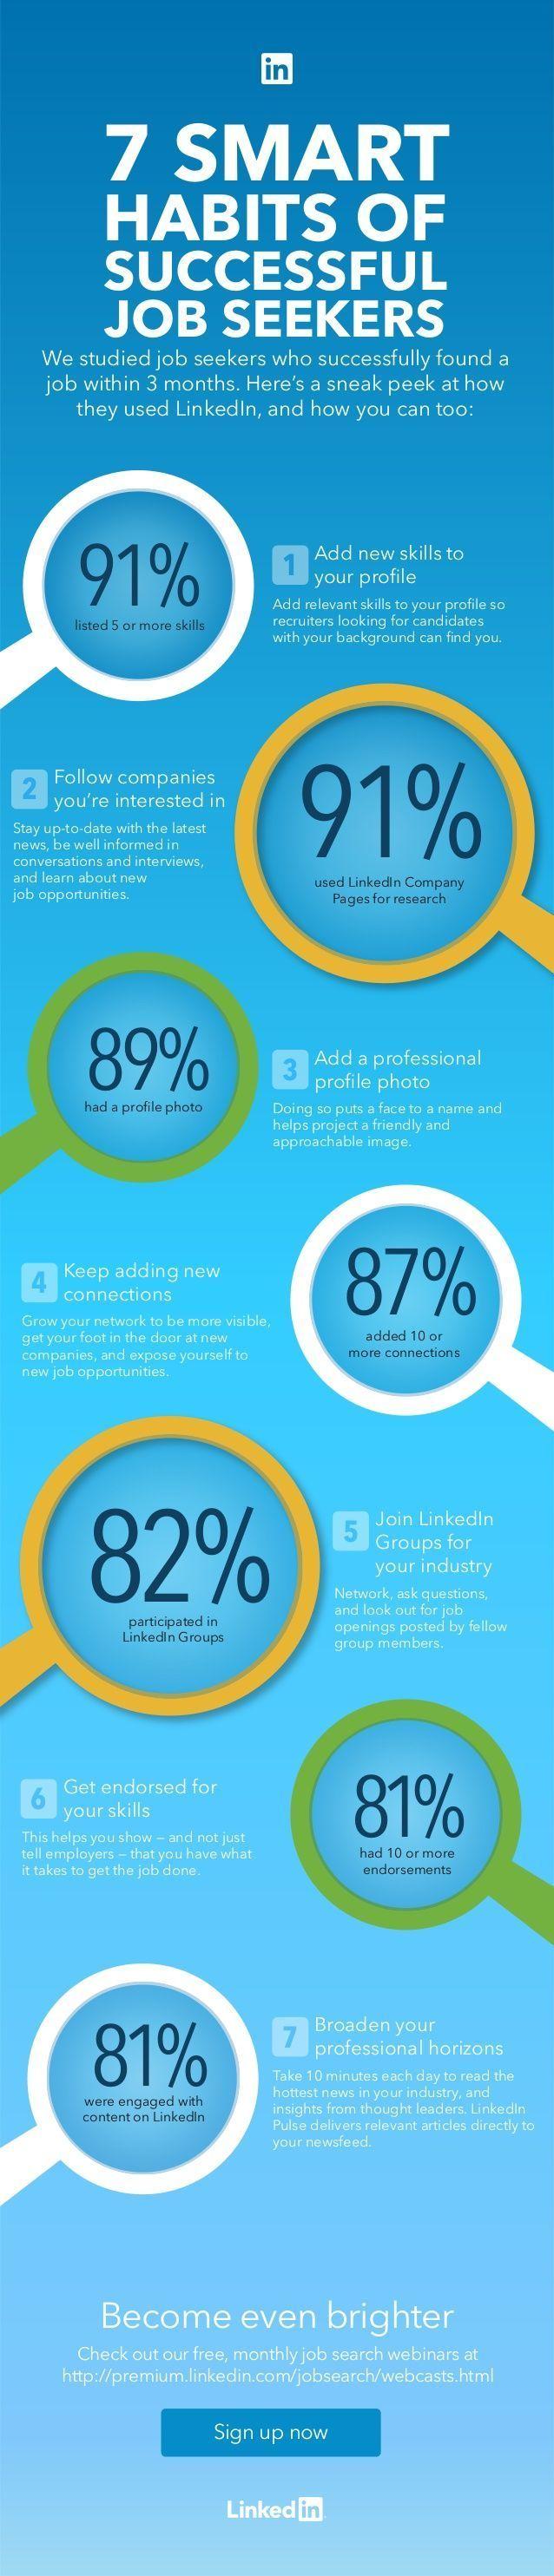 7 Smart LinkedIn Habits of Successful Job Seekers [Infographic]